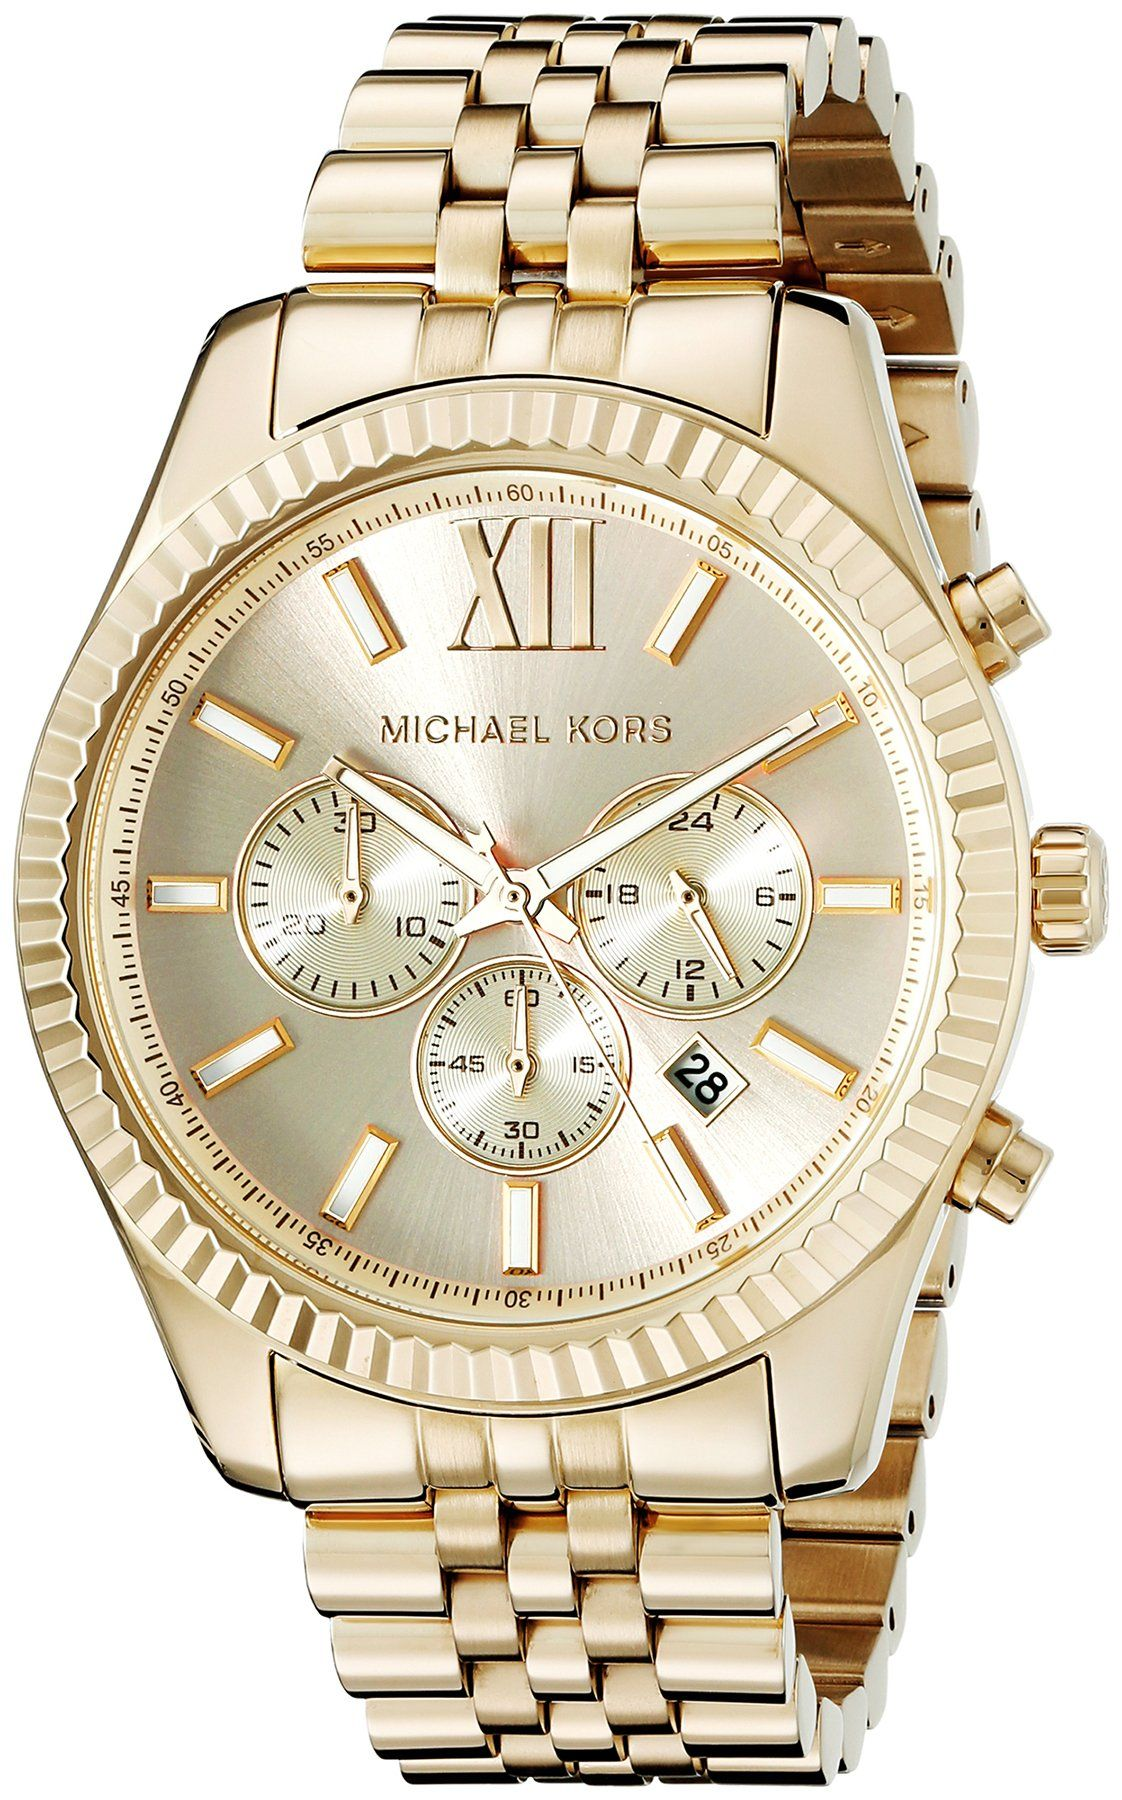 Michael Kors Herren Uhr MK8281 | Uhren herren